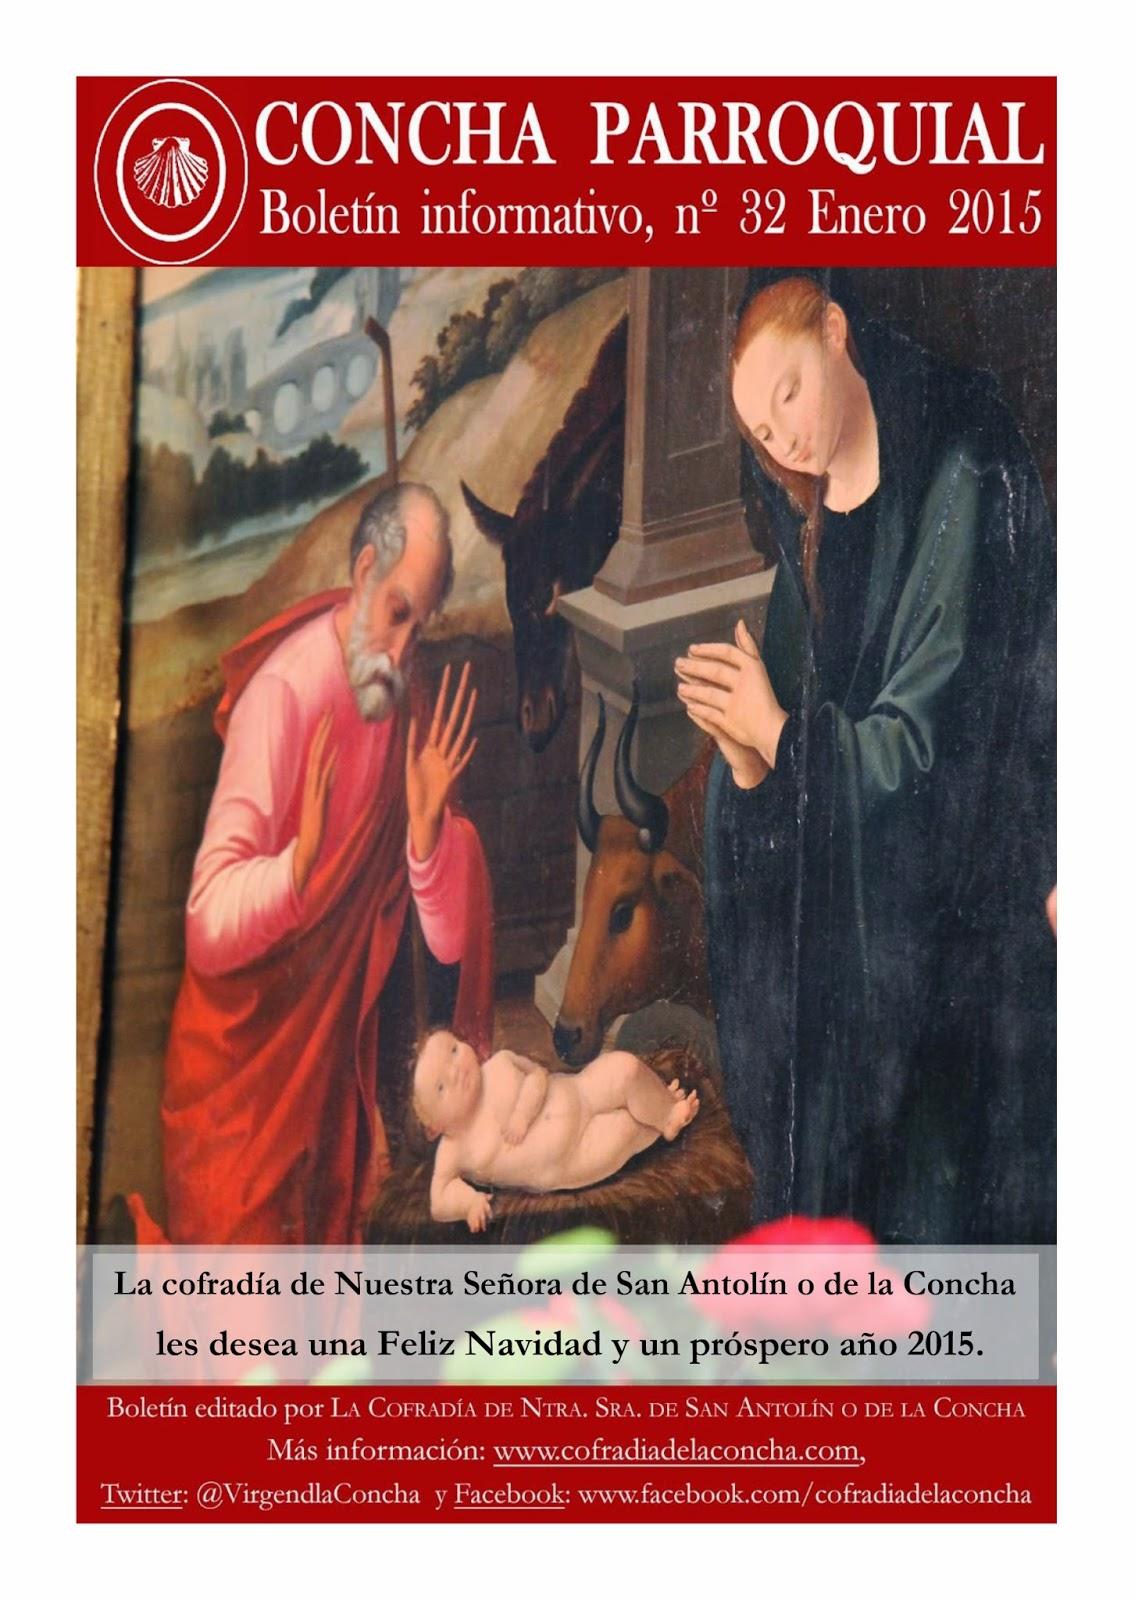 http://www.cofradiadelaconcha.com/boletines/2015/Enero2015.PDF